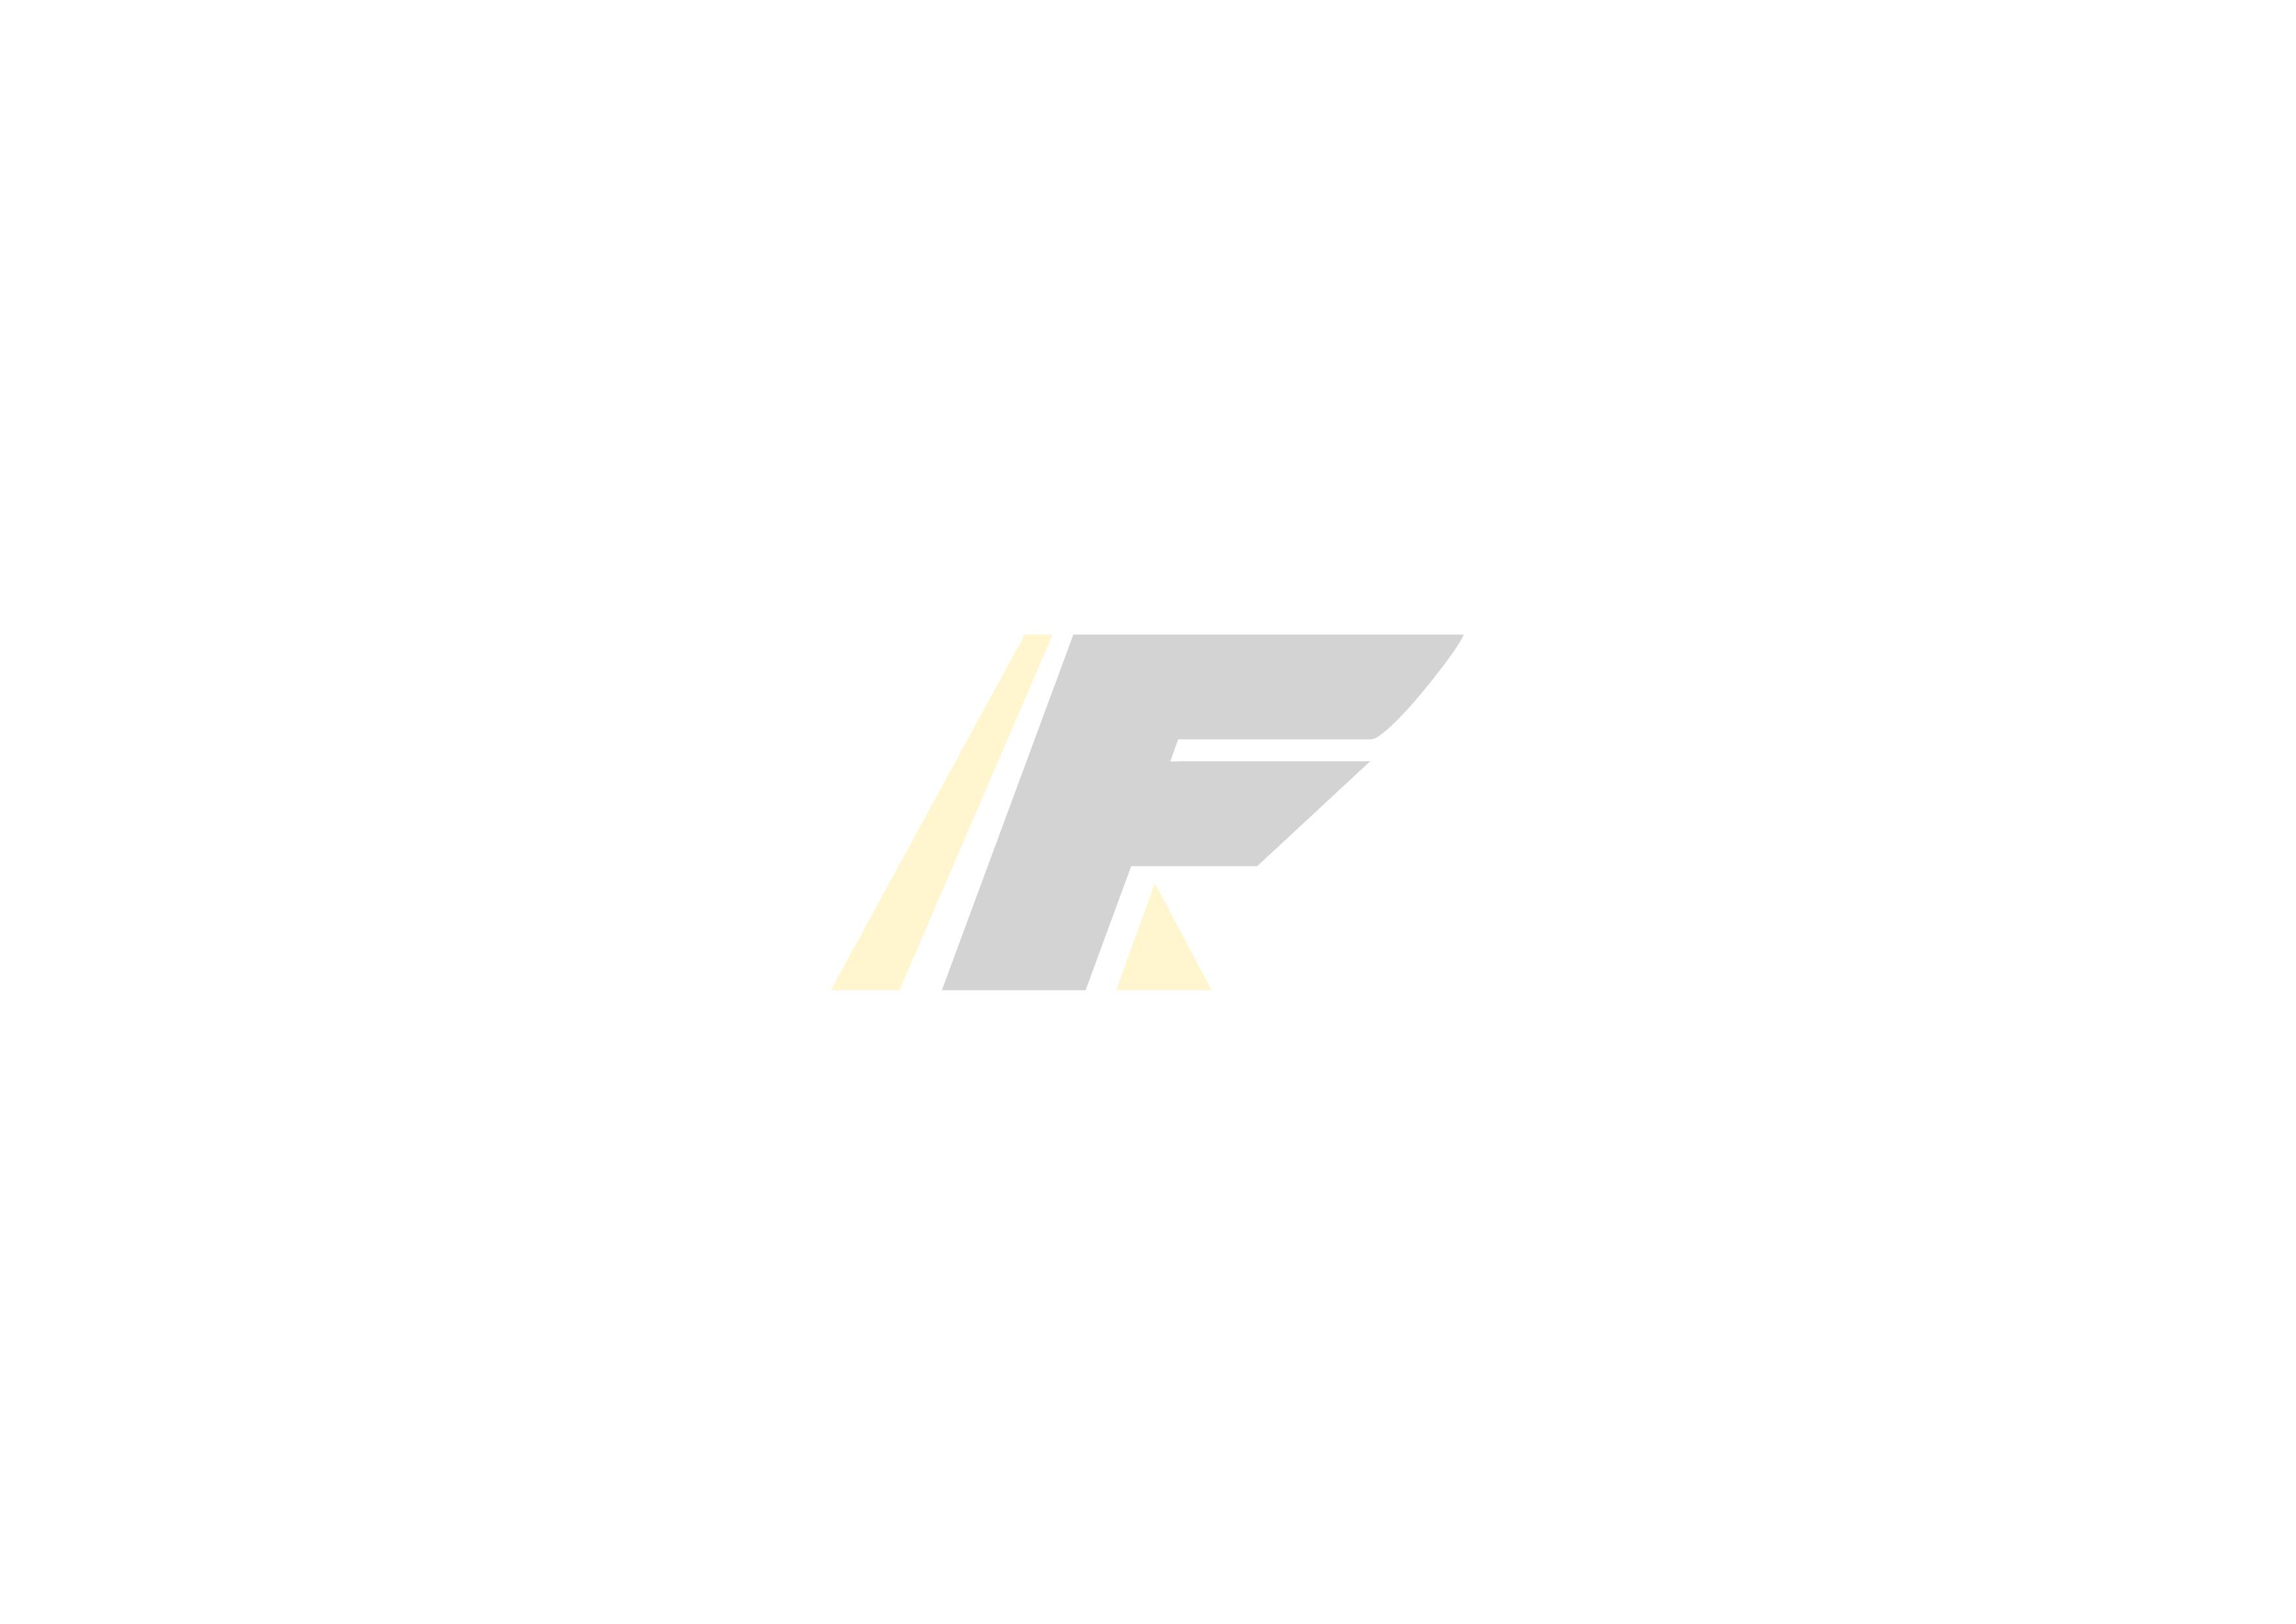 Dunlop - KT335 Quad Competition Radial